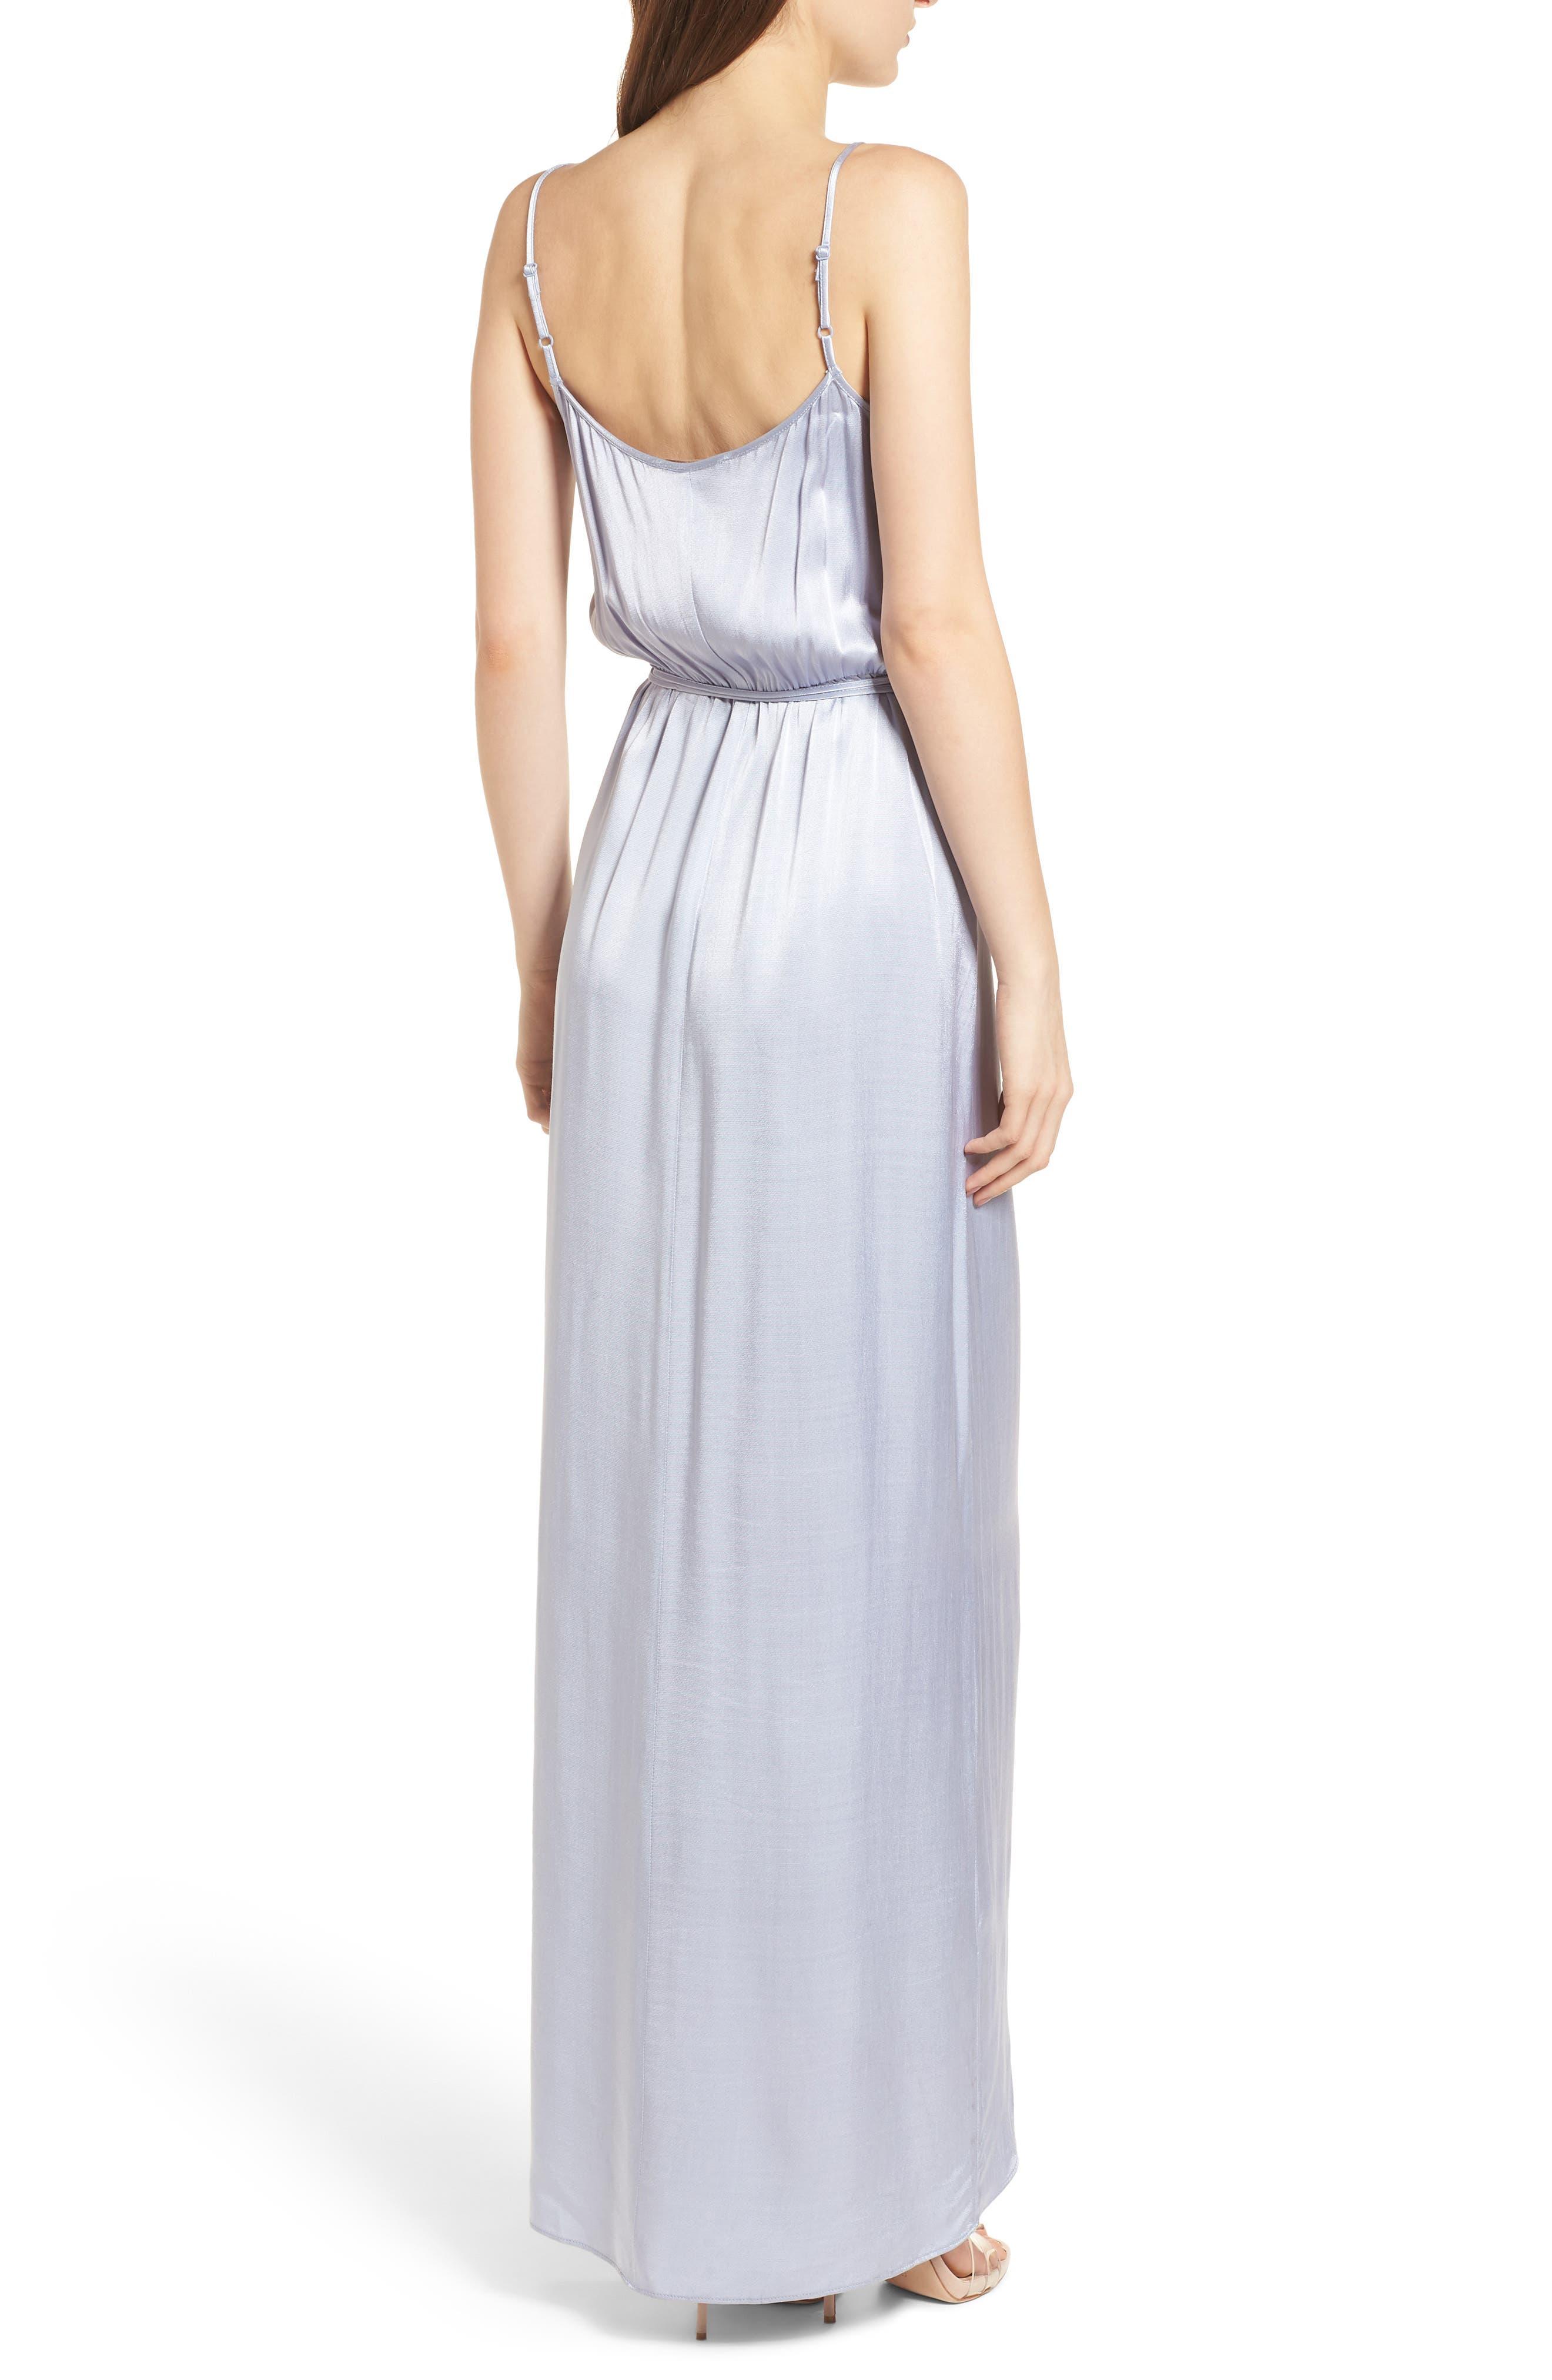 Teagan Satin Wrap Maxi Dress,                             Alternate thumbnail 2, color,                             400